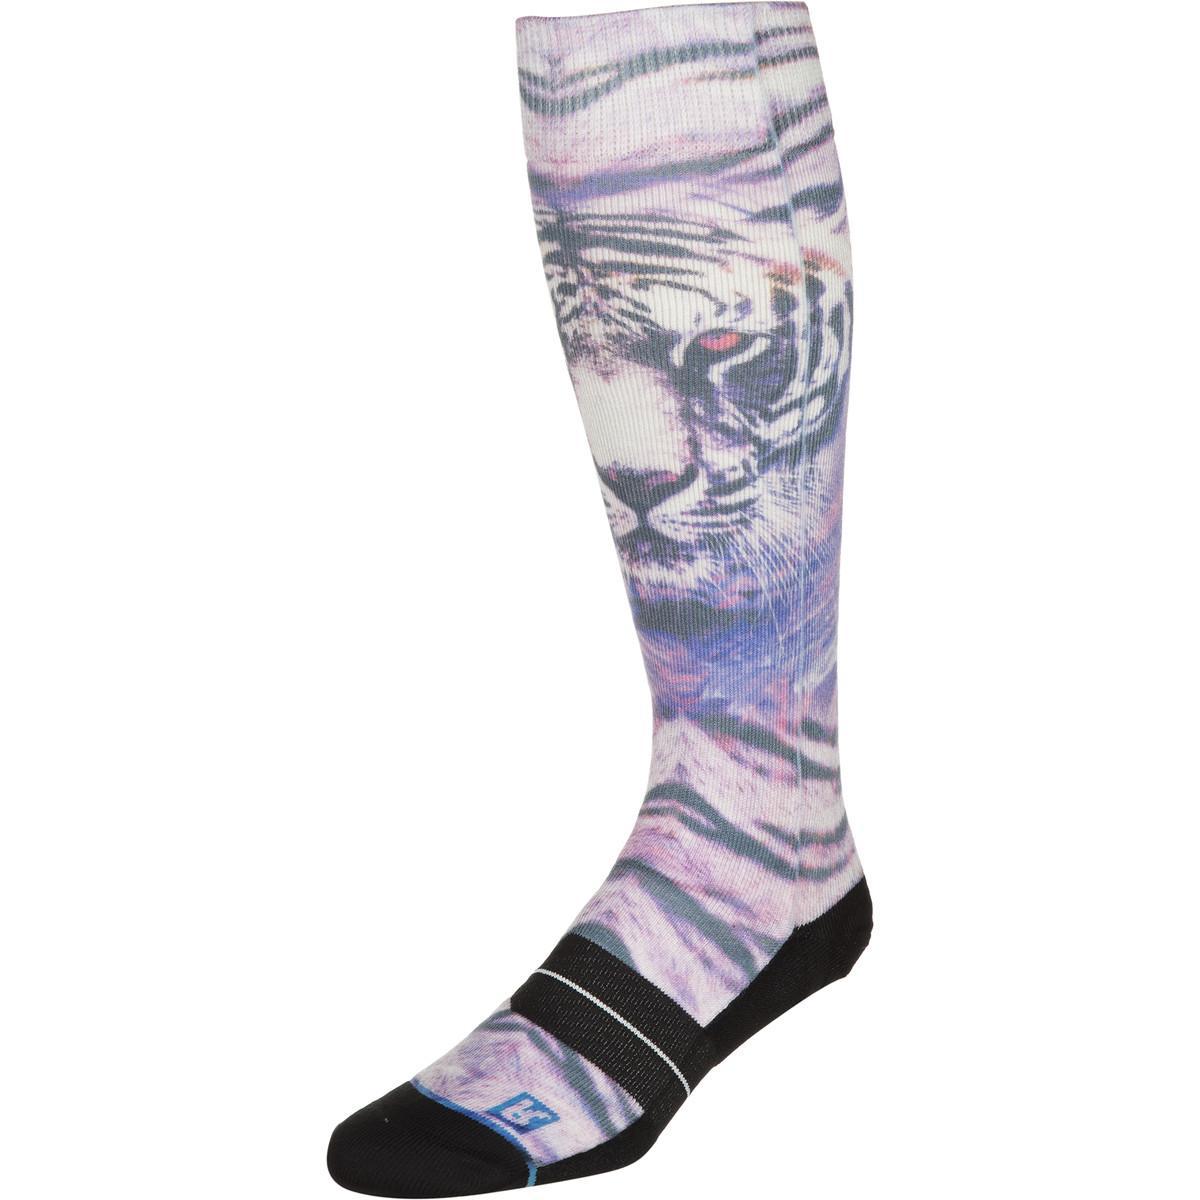 Stance Artist Series Snowboard Sock - Women's White Bengal,